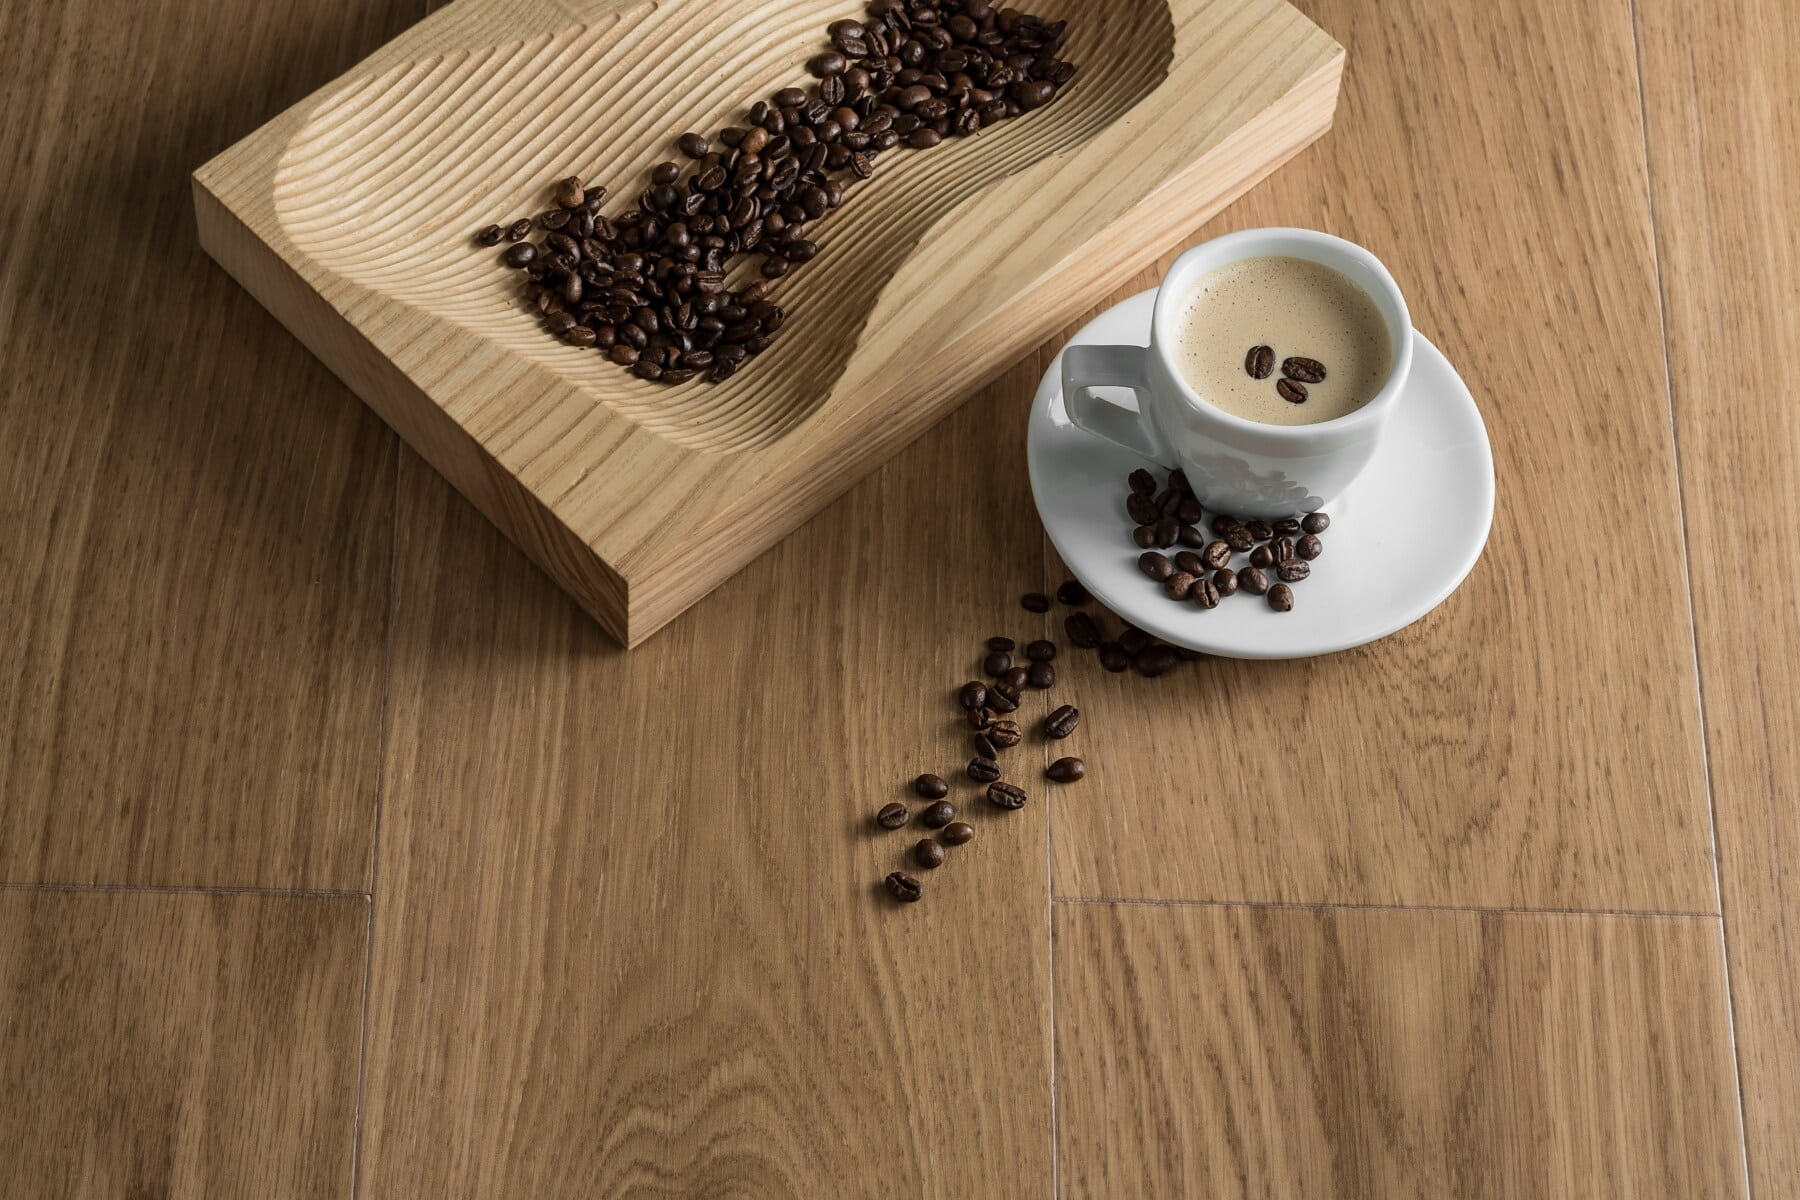 caffeine, cappuccino, warm, coffee mug, coffee, seed, hot, breakfast, beverage, drink